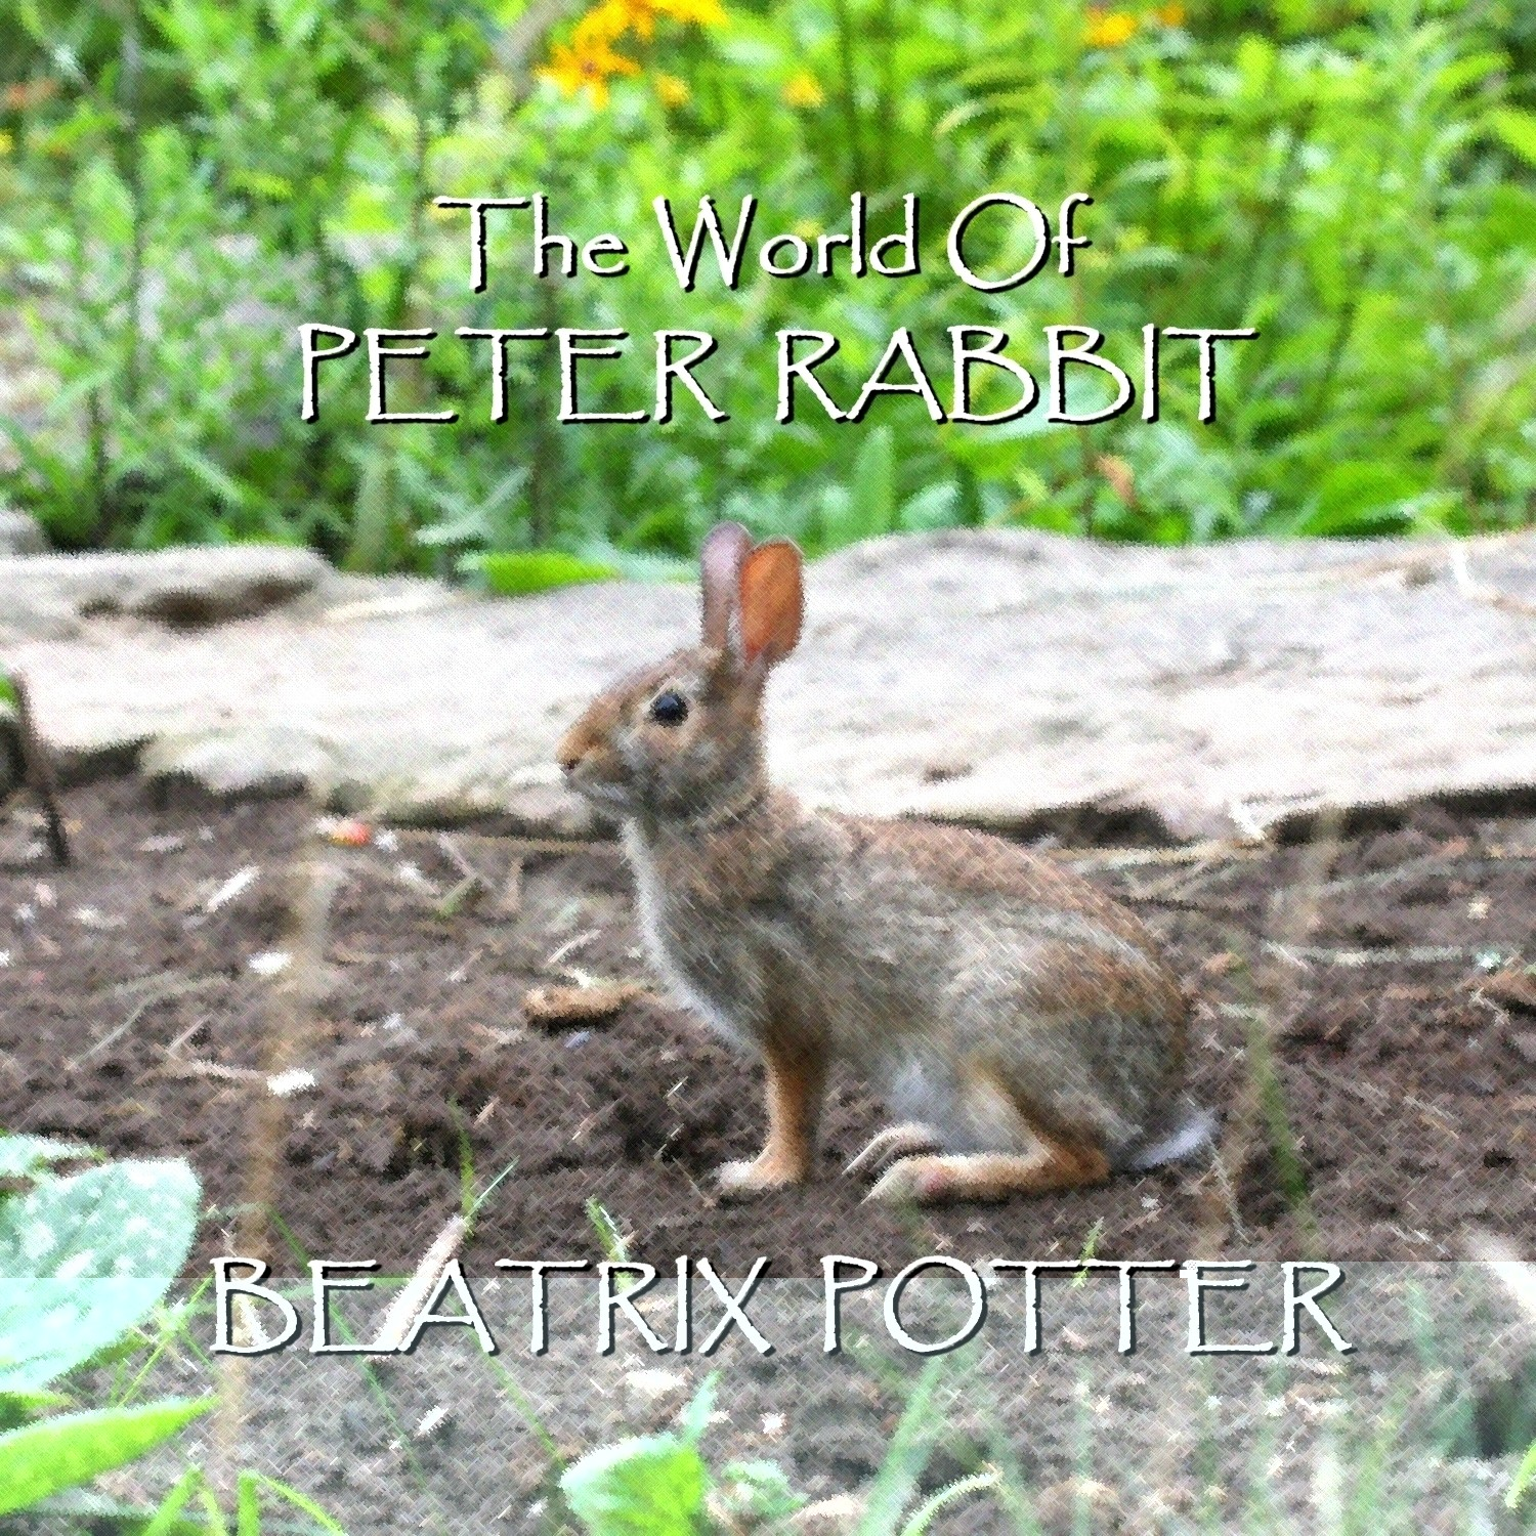 Printable Beatrix Potter: The Short Stories Audiobook Cover Art